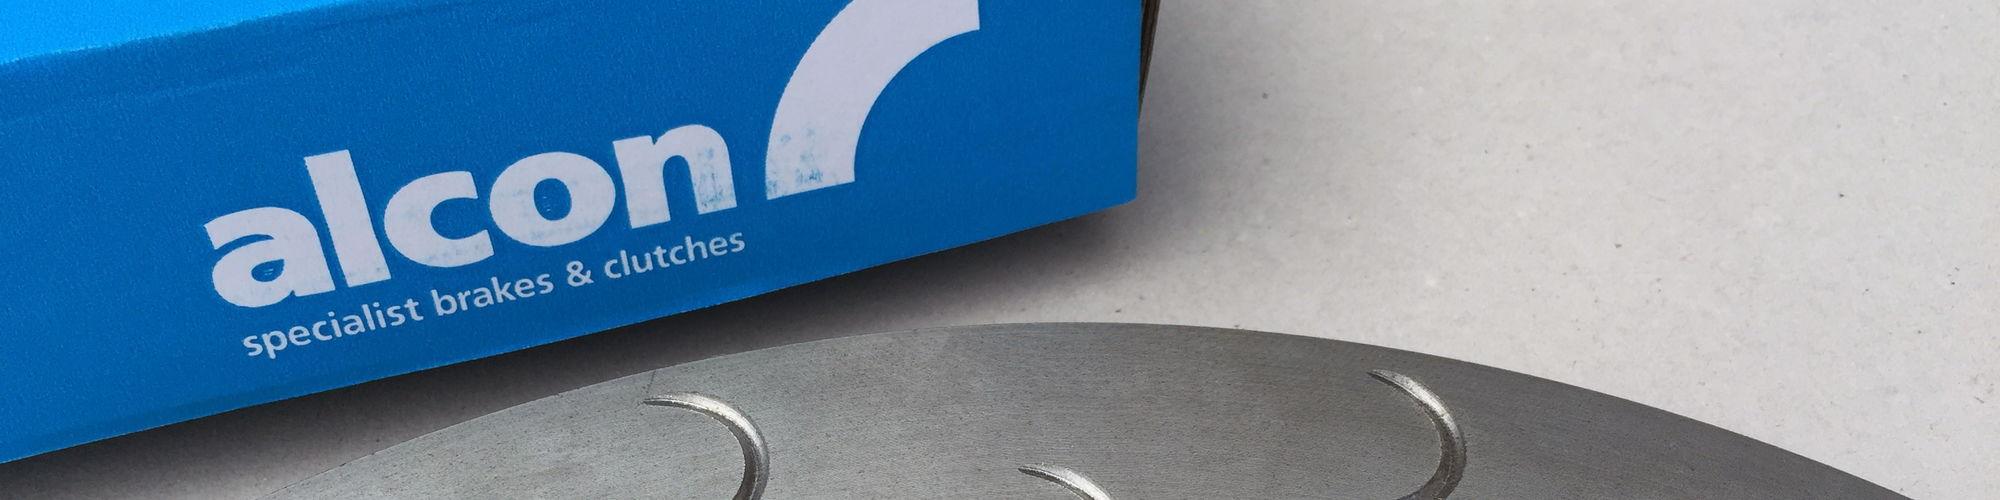 alcon: specialist brakes & clutches